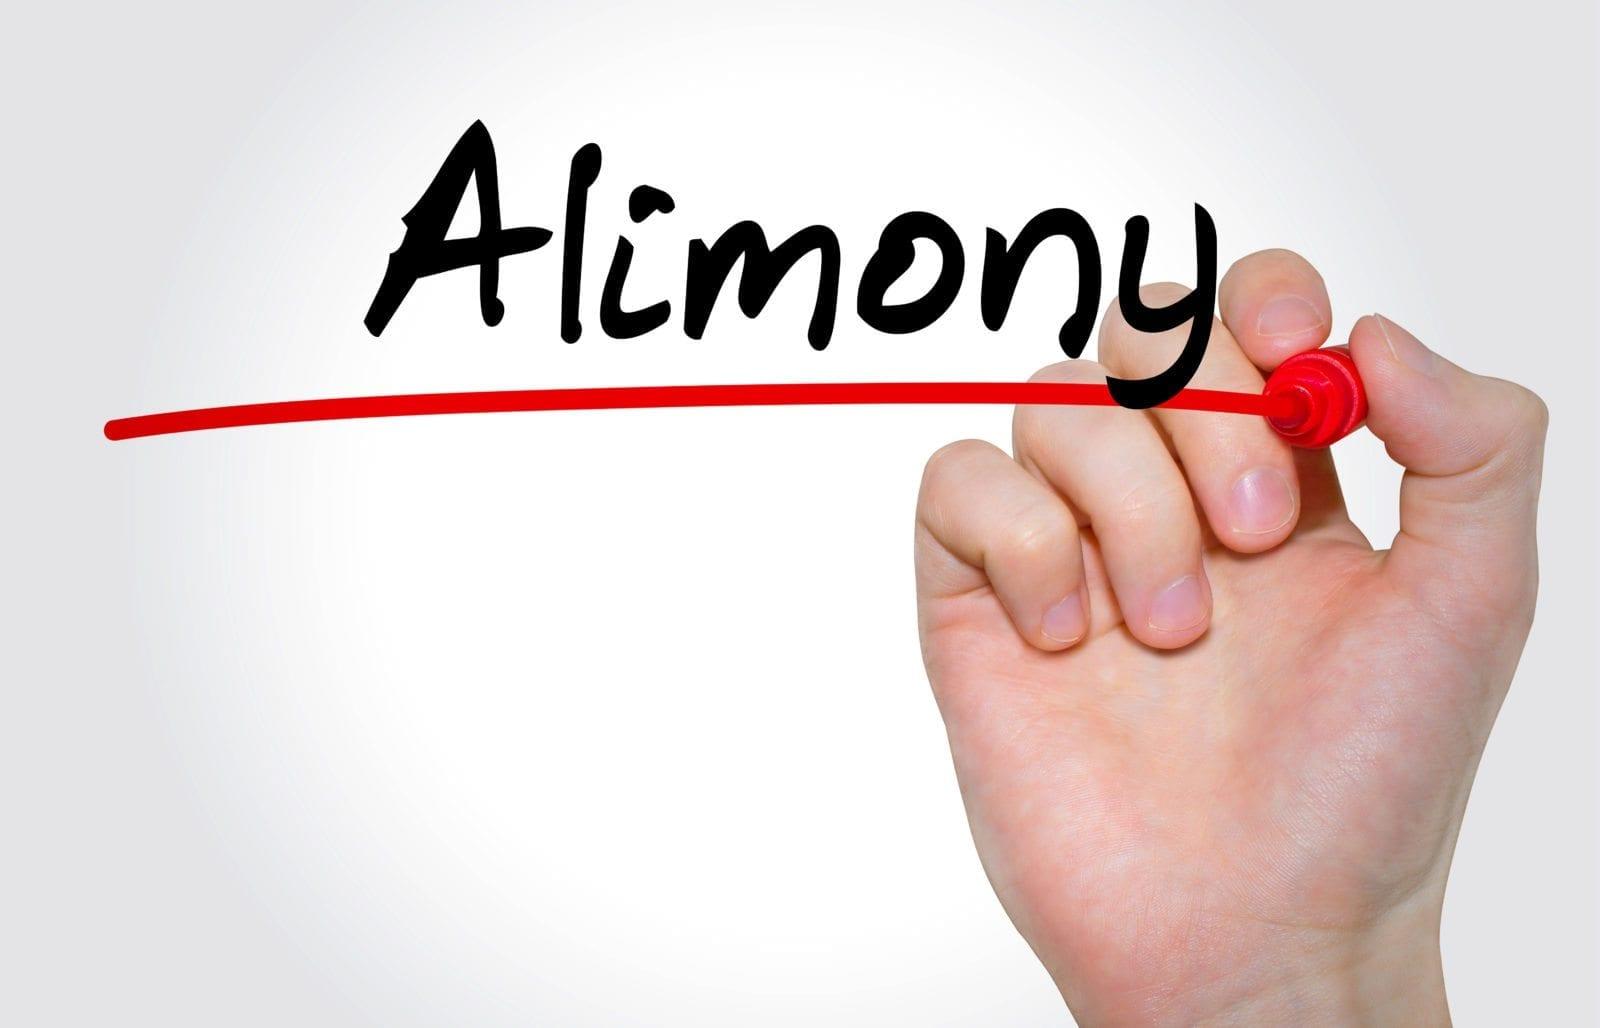 Alimony in North Carolina